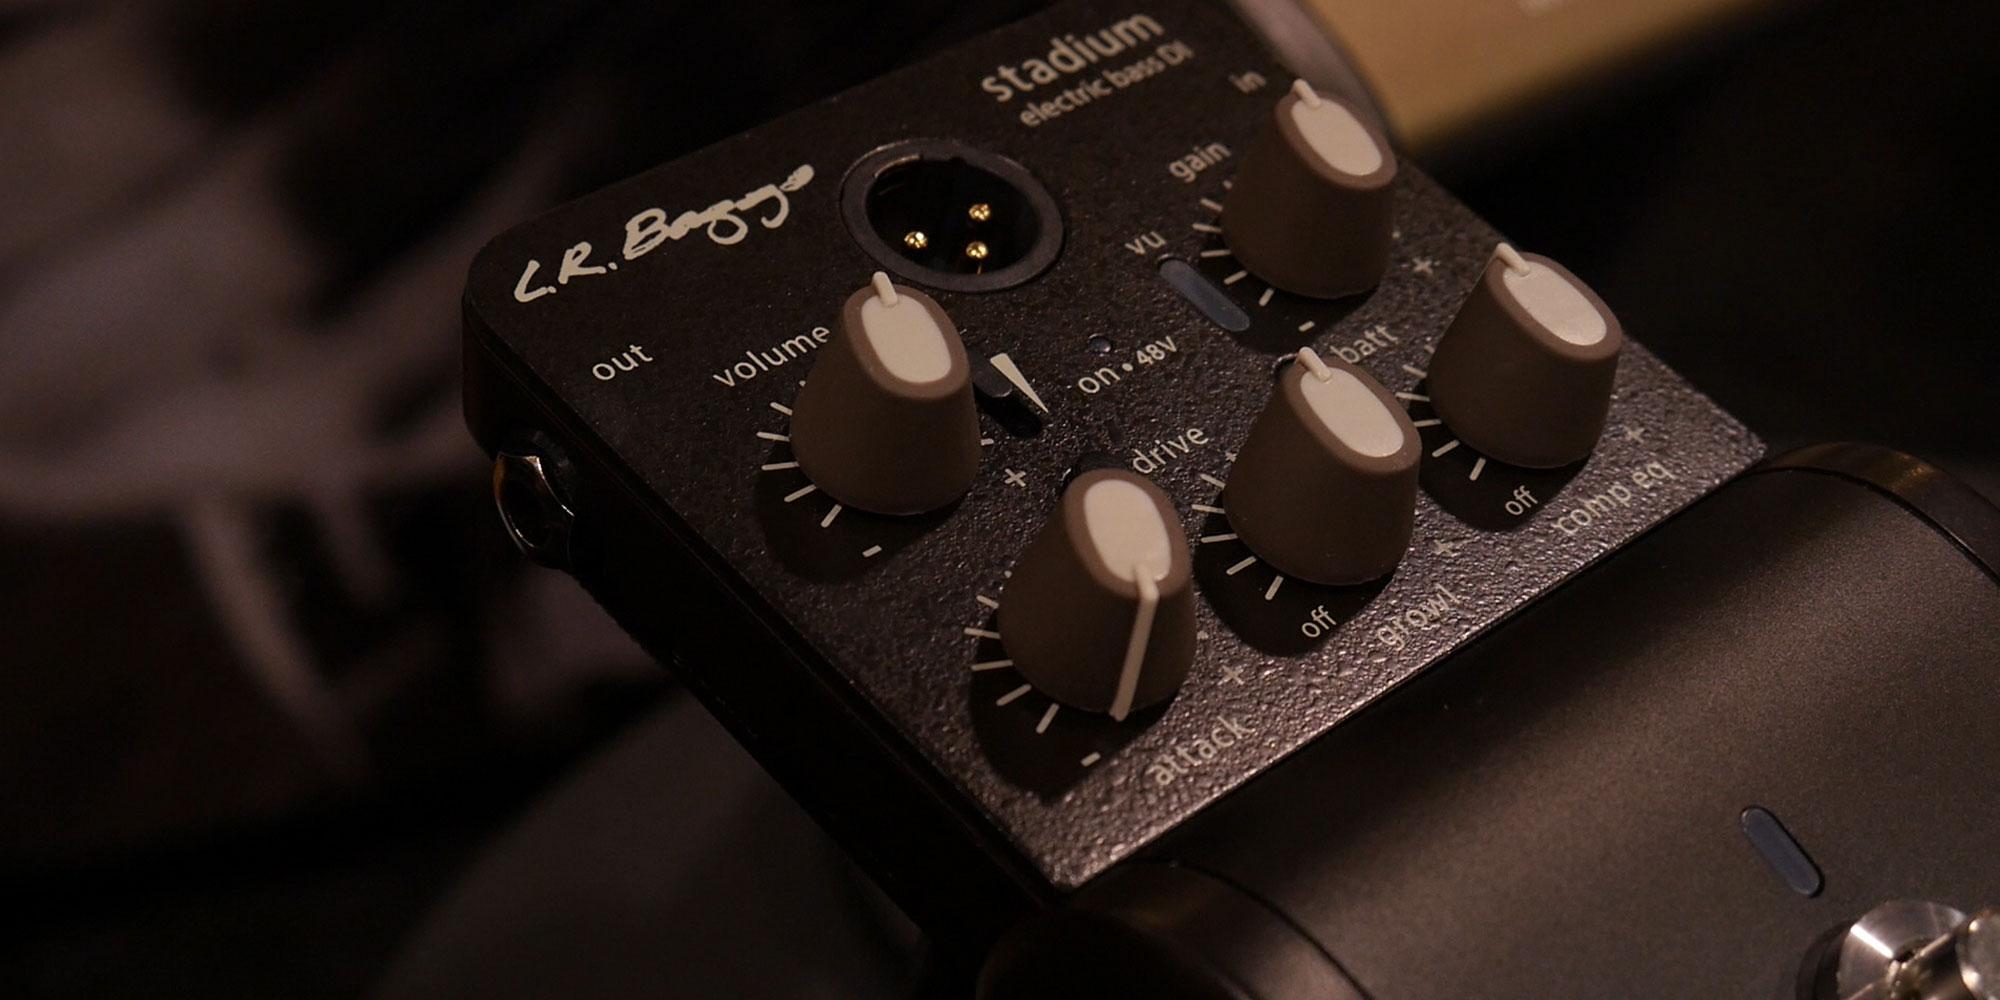 LR Baggs Stadium Electric Bass DI